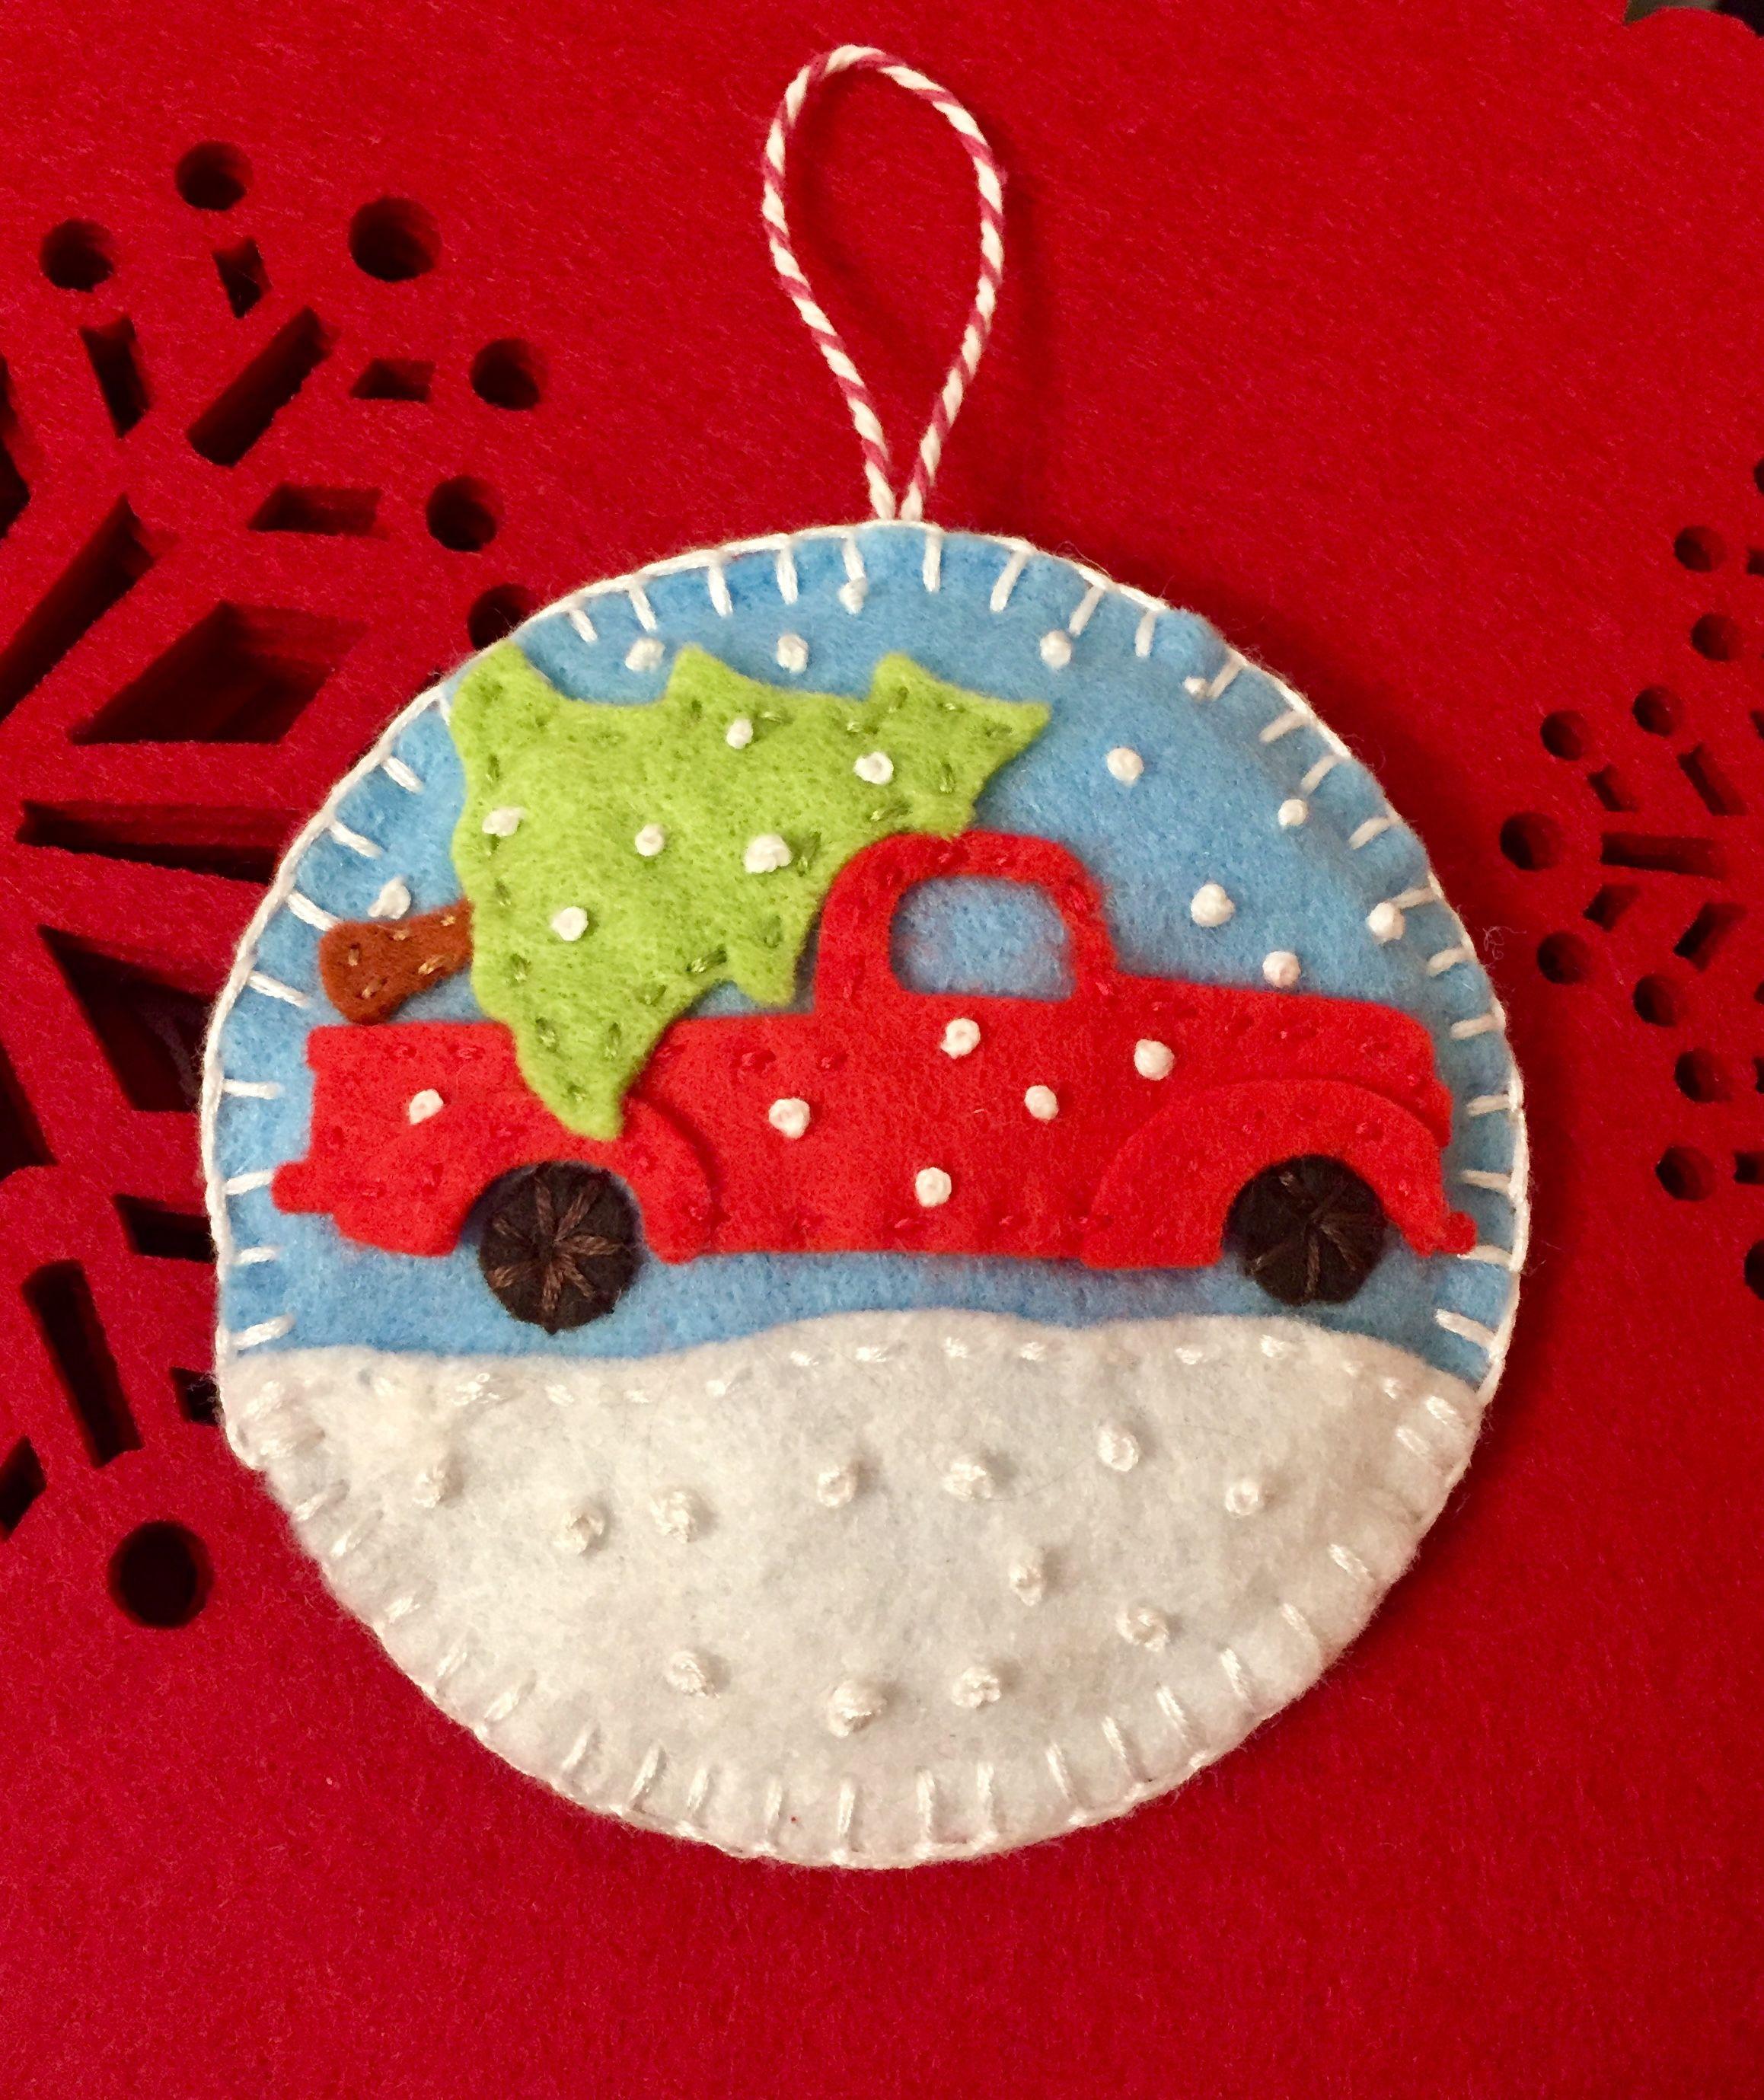 Felt Christmas Ornament Wool Applique Pinterest Felt Sewn Christmas Ornaments Felt Christmas Decorations Felt Christmas Ornaments